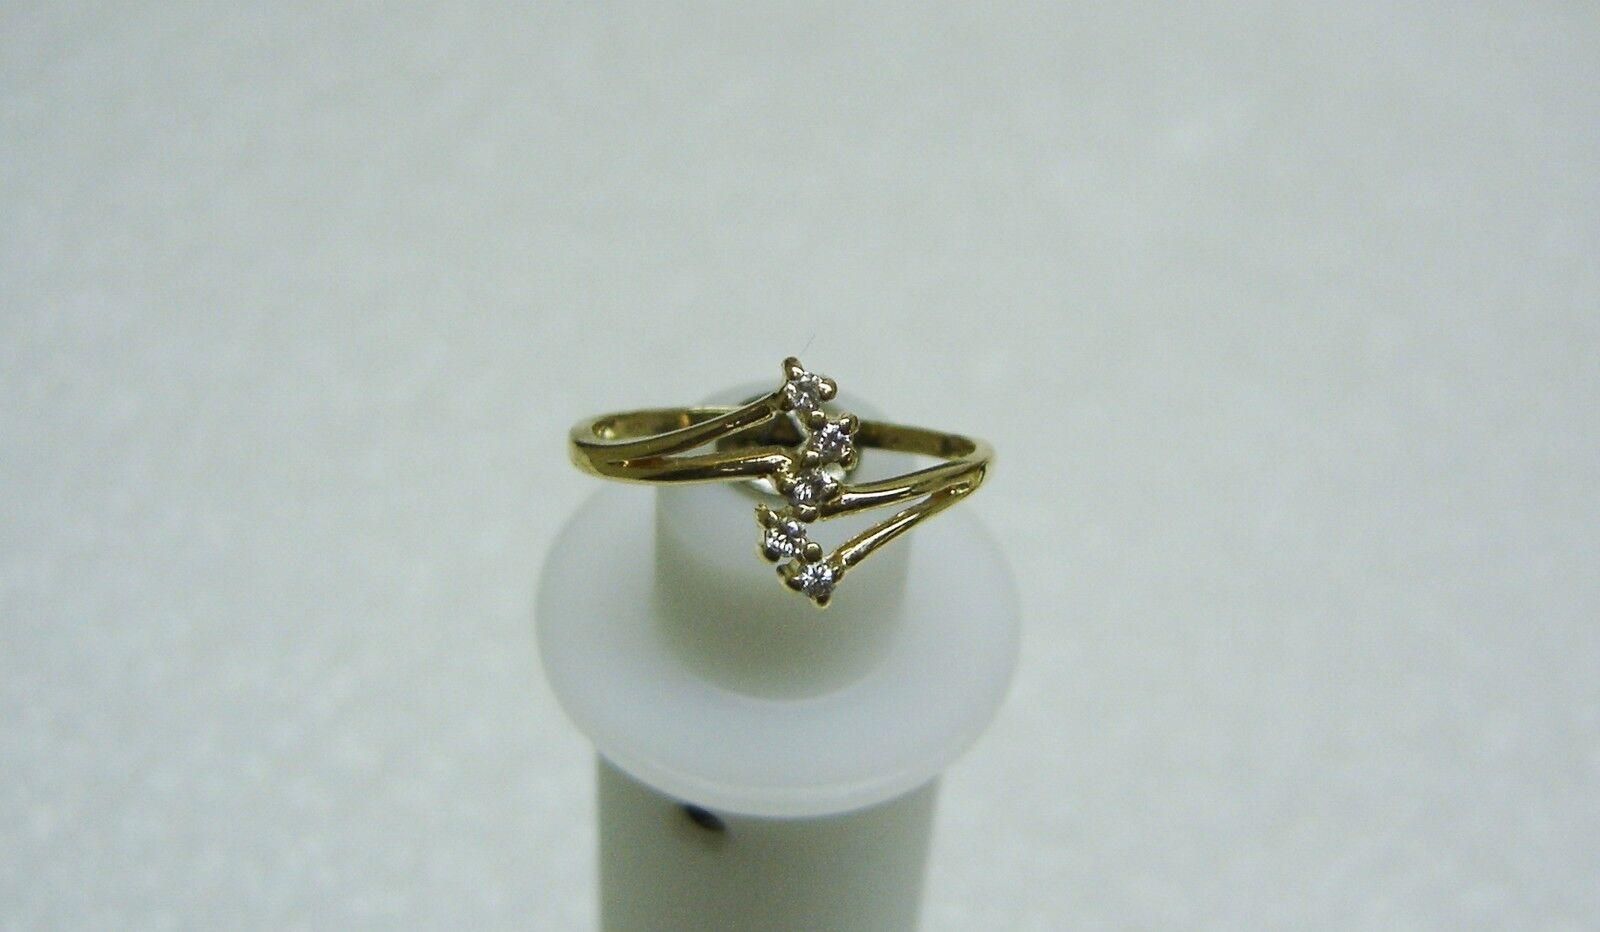 14K YELLOW gold 5 DIAMOND JOURNEY  RING SIZE 6 1 2 APRIL BIRTHSTONE 212-M